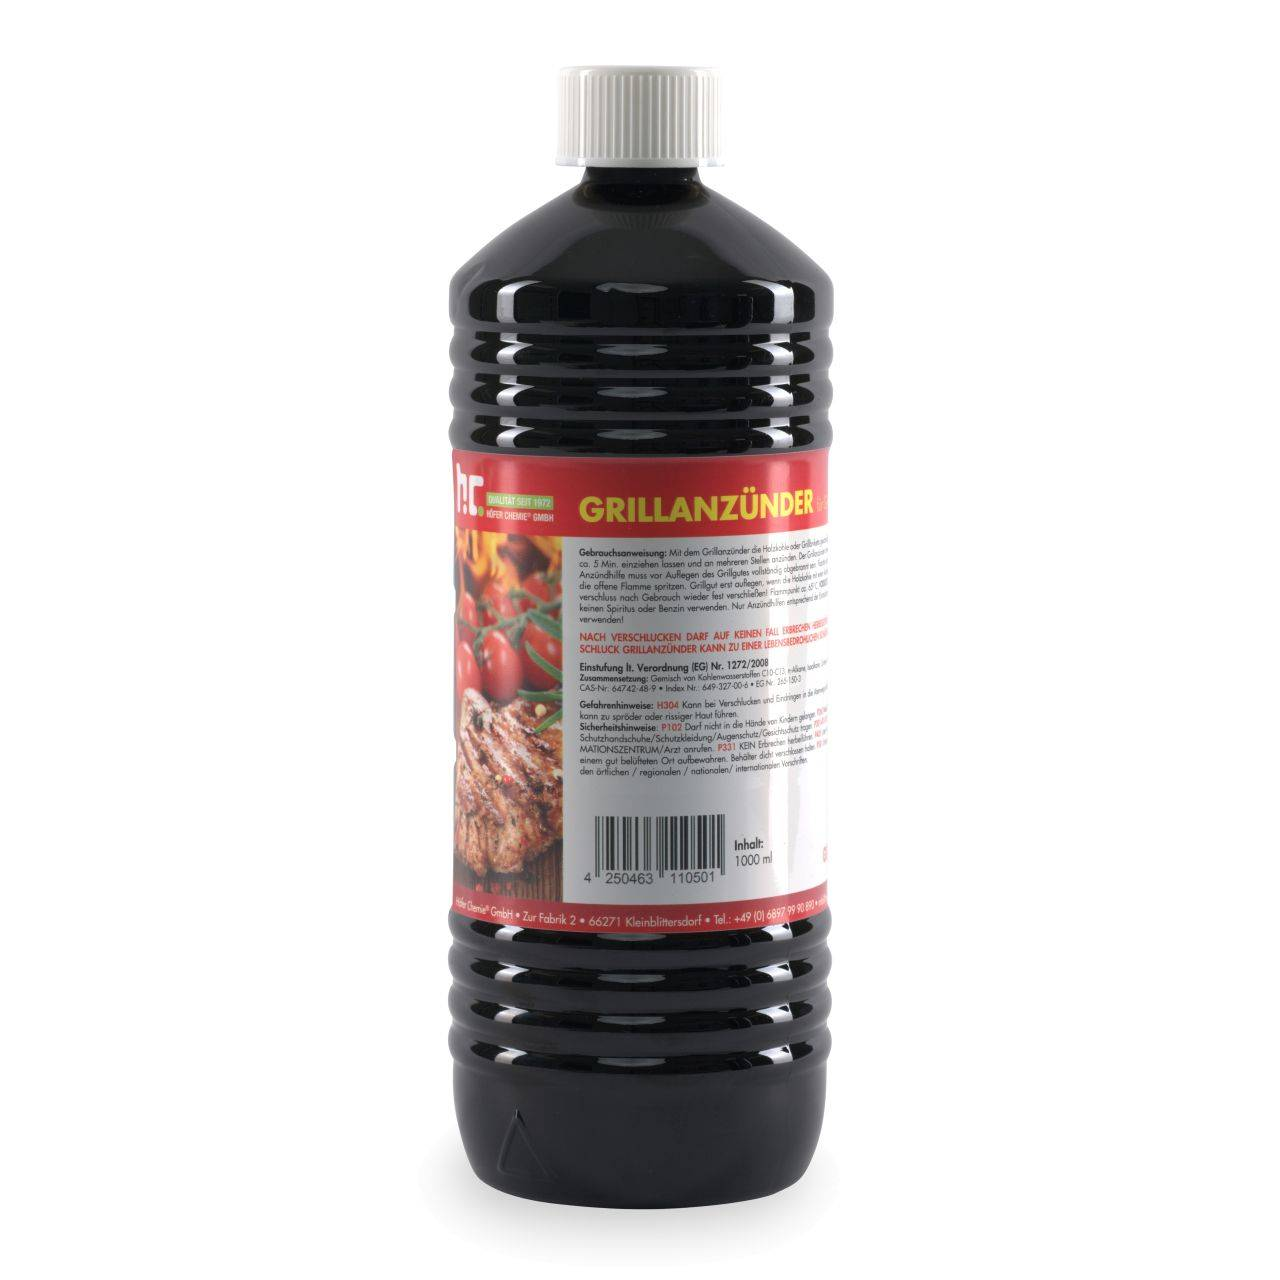 Höfer Chemie 30 l Allume-feu liquide pour barbecue (30 x 1 l)